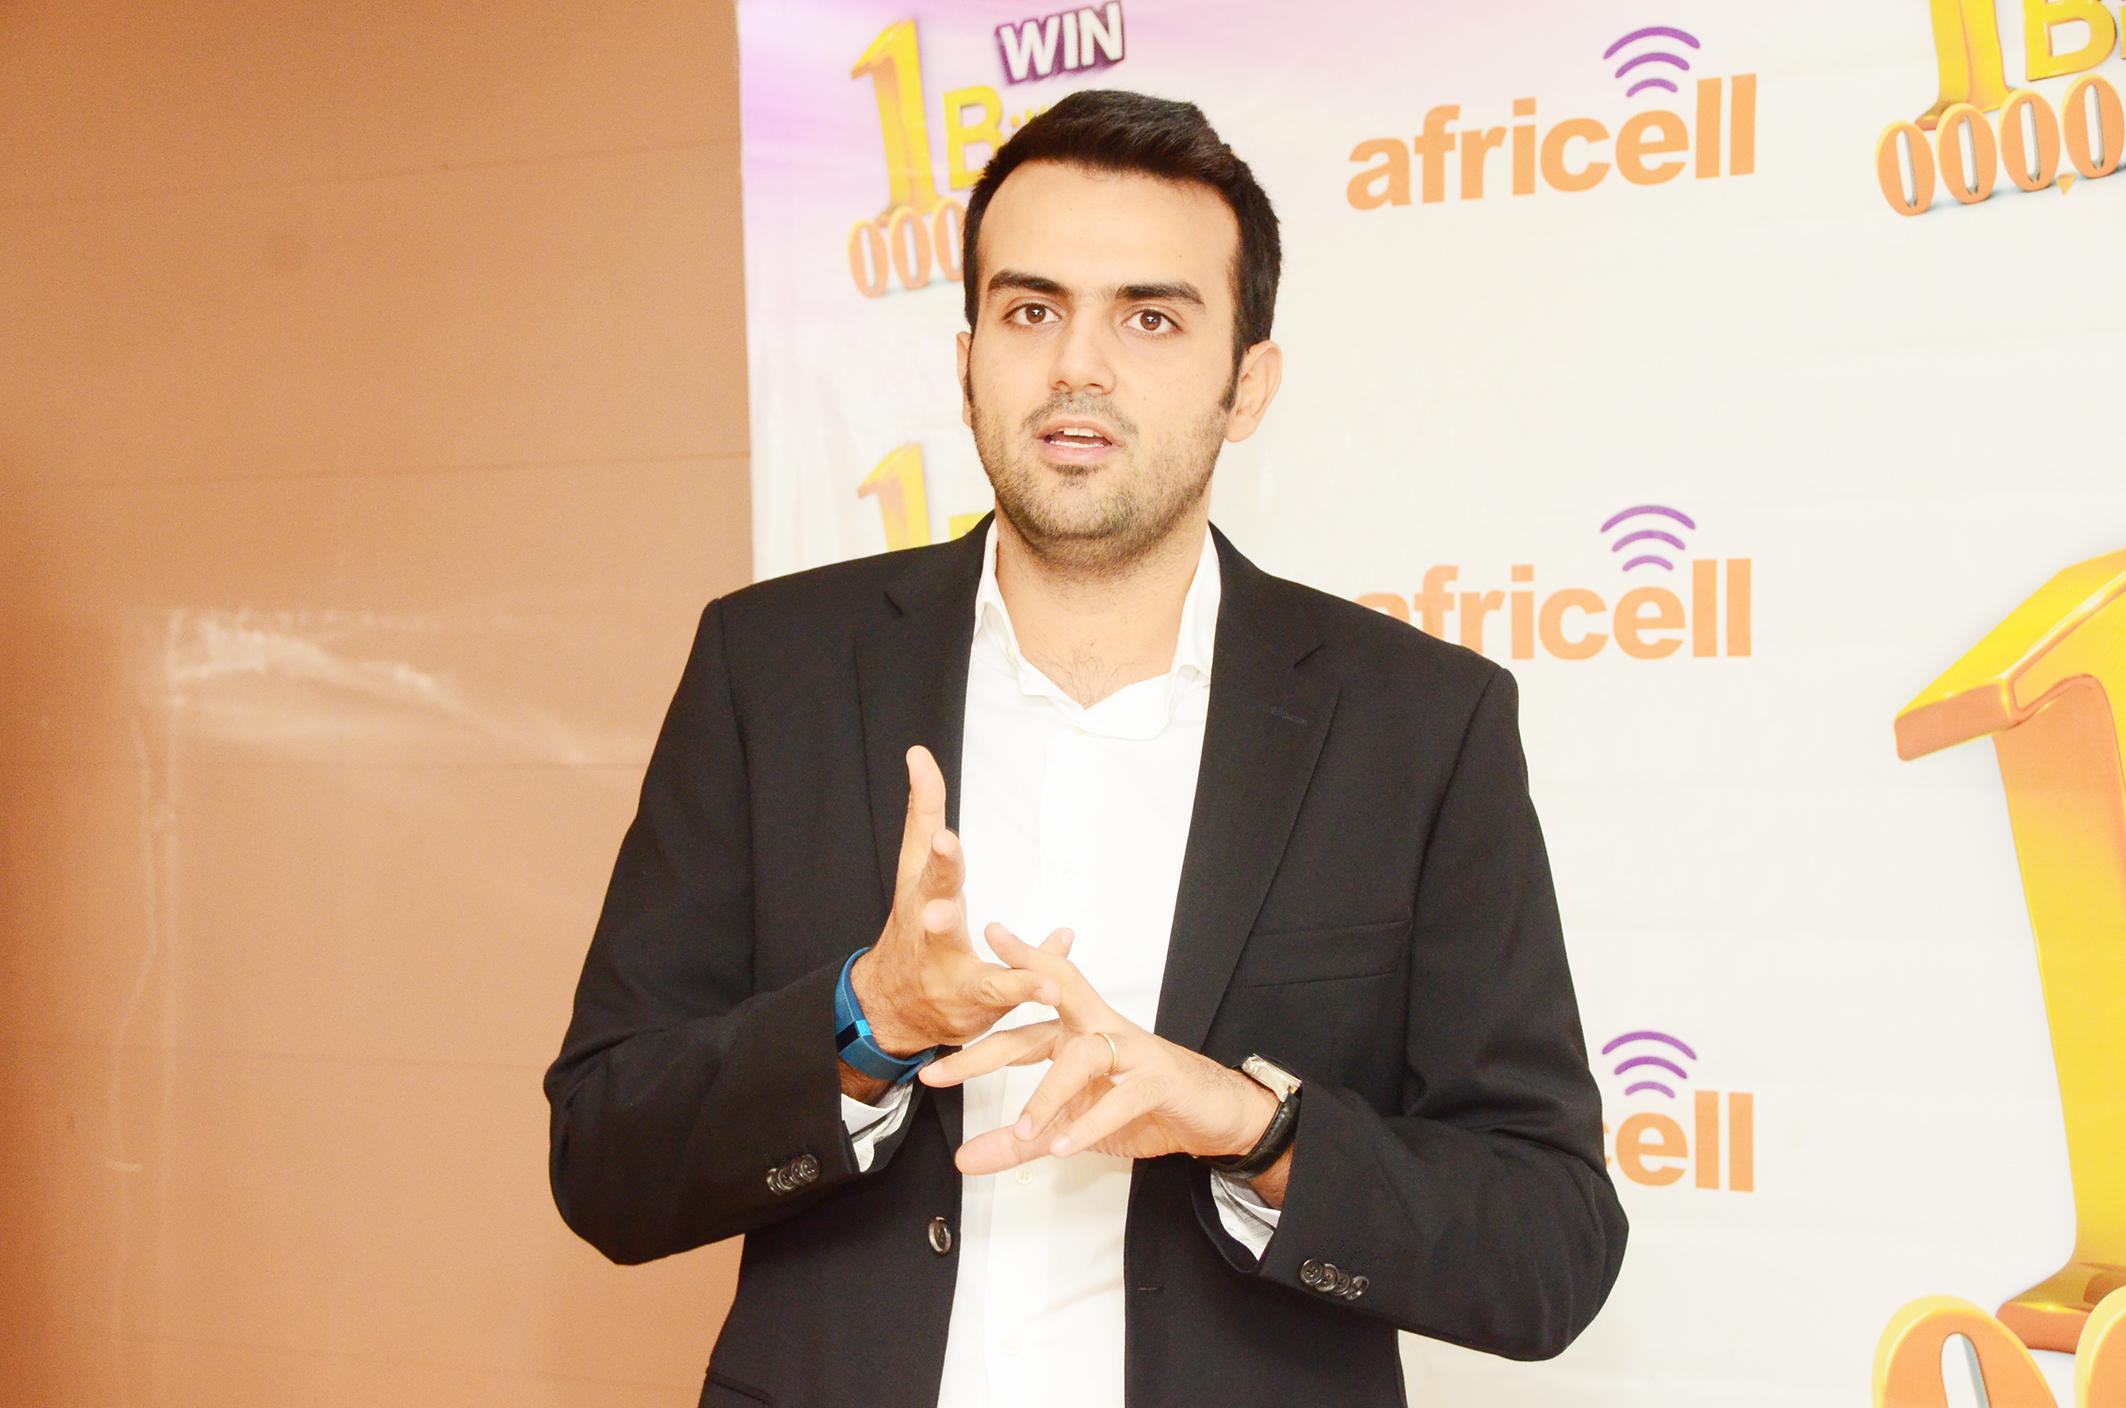 africell-commercial-director-milad-khairallah-explaining-the-one-billion-shillings-promo